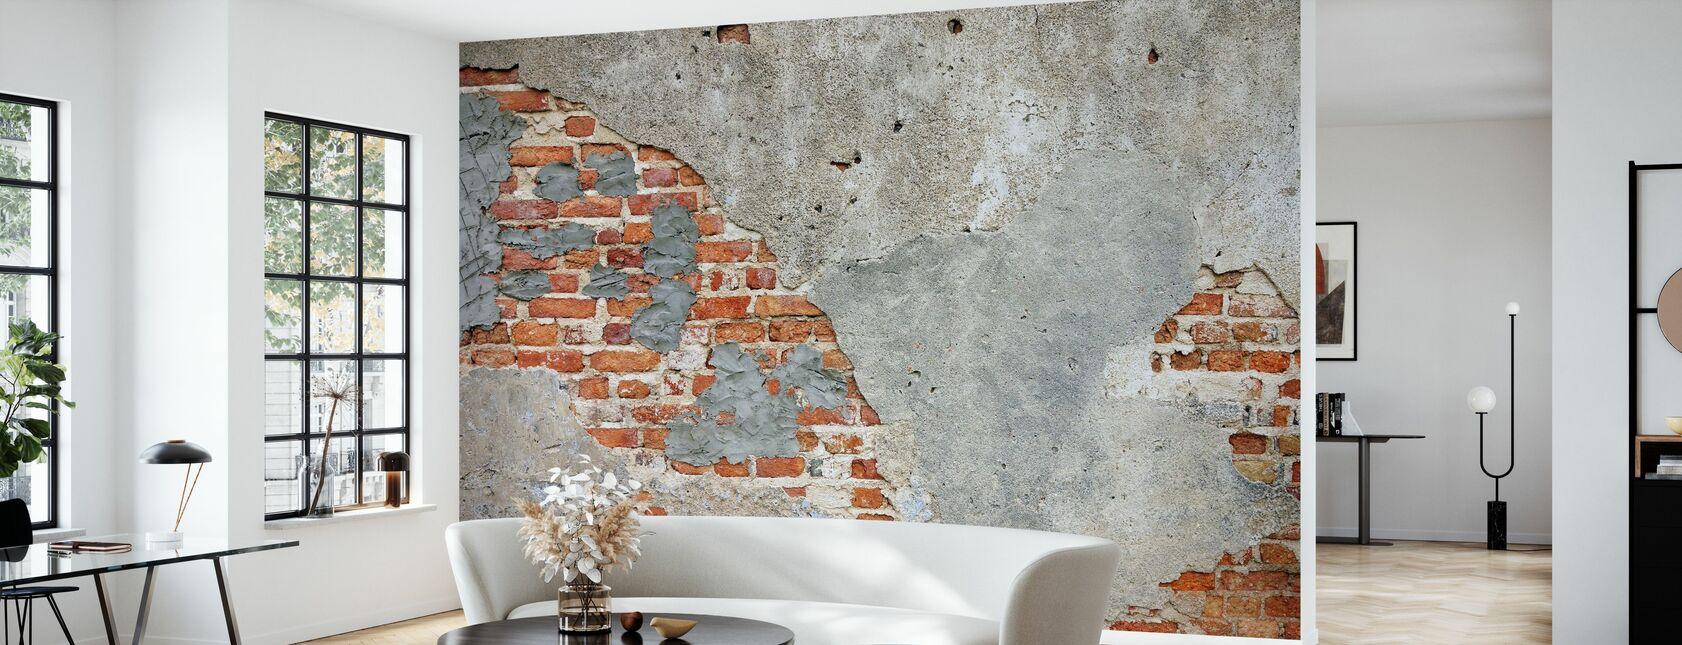 Brick Wall - Wallpaper - Living Room